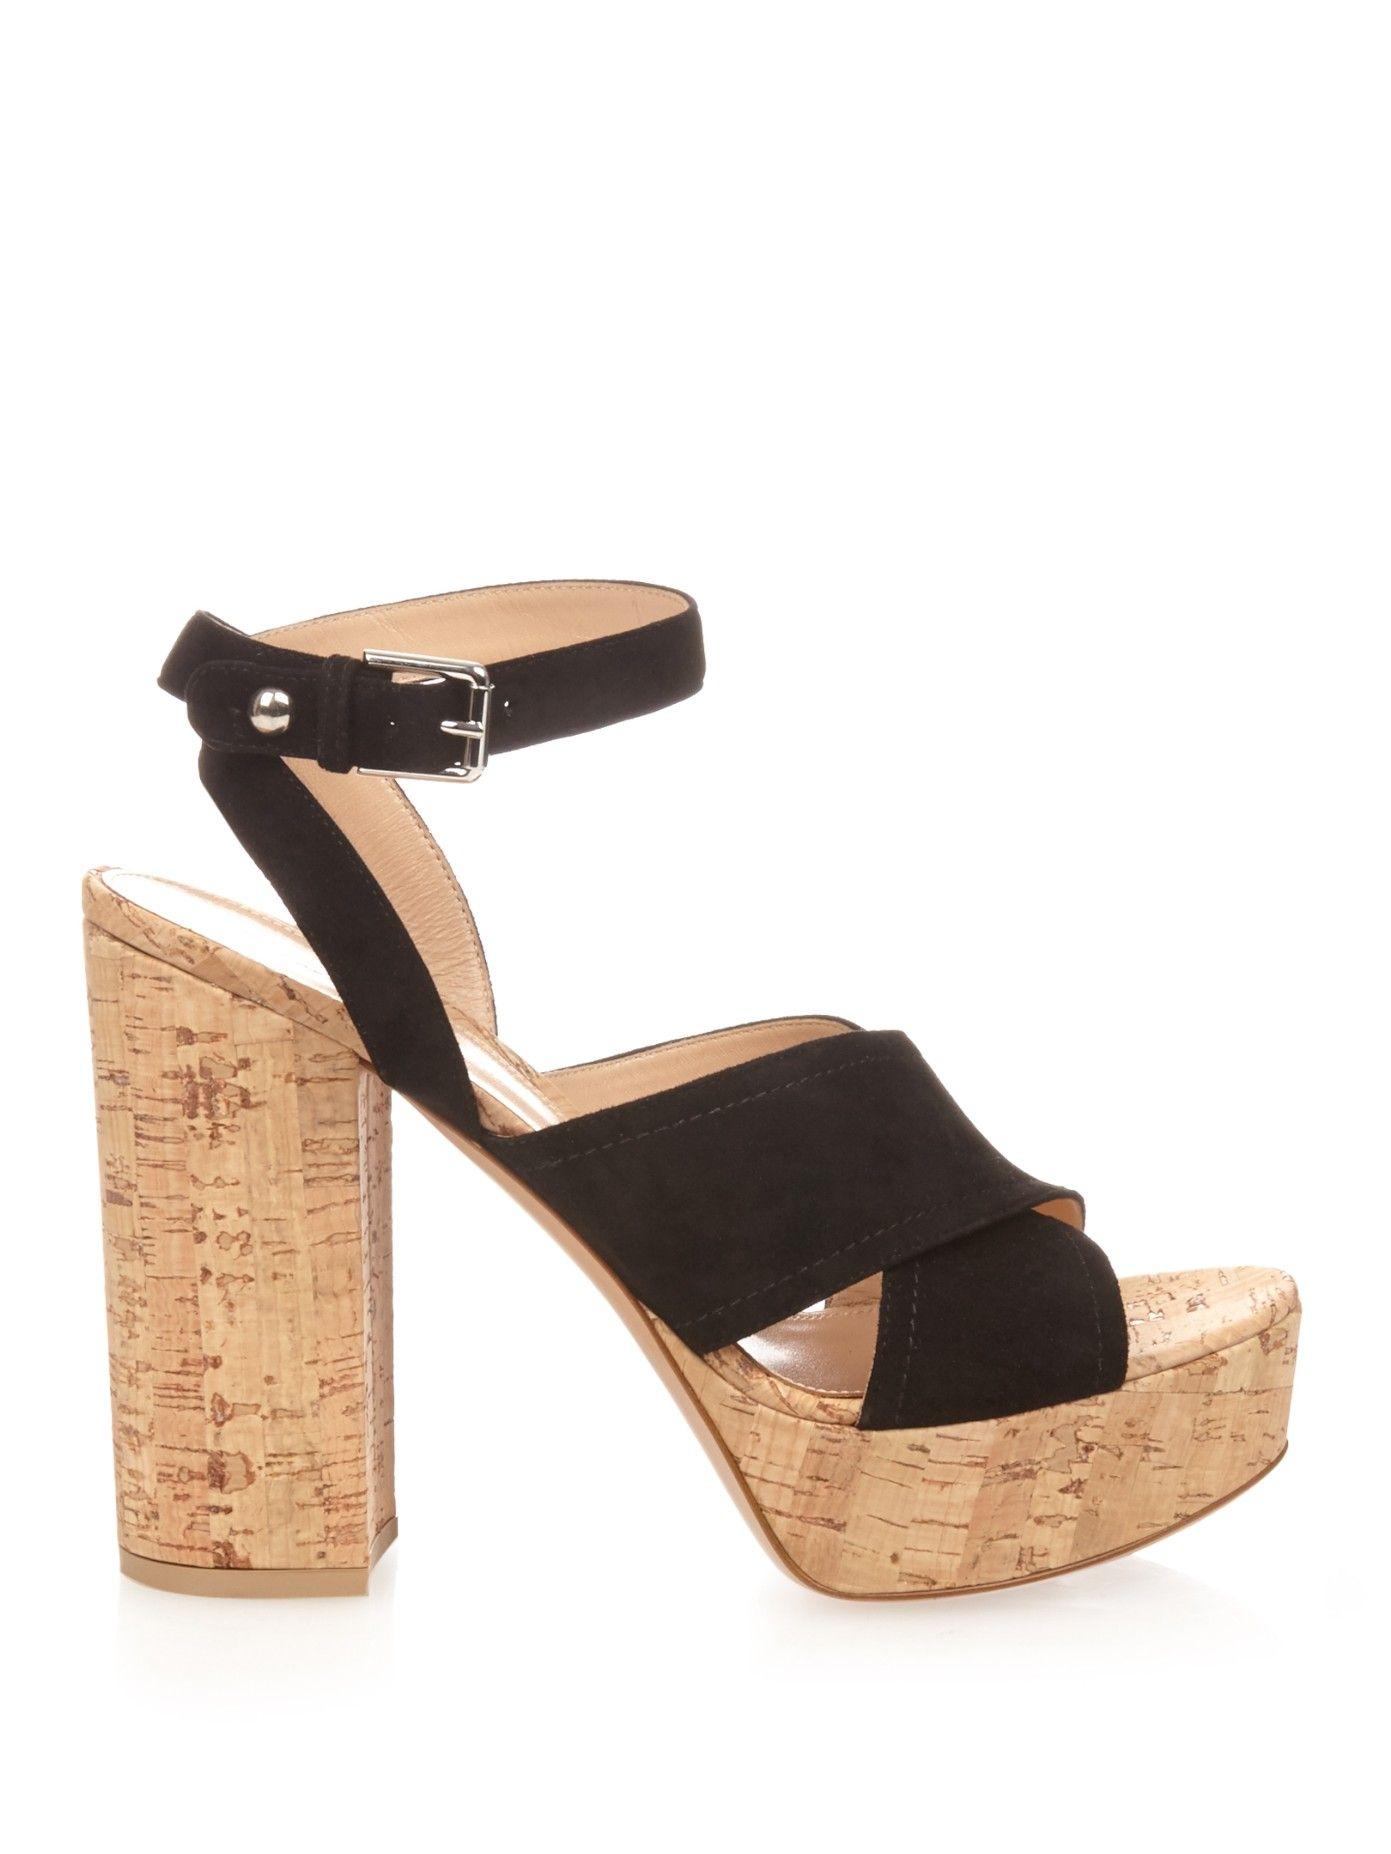 9e02c13c566 Suzie suede platform sandals